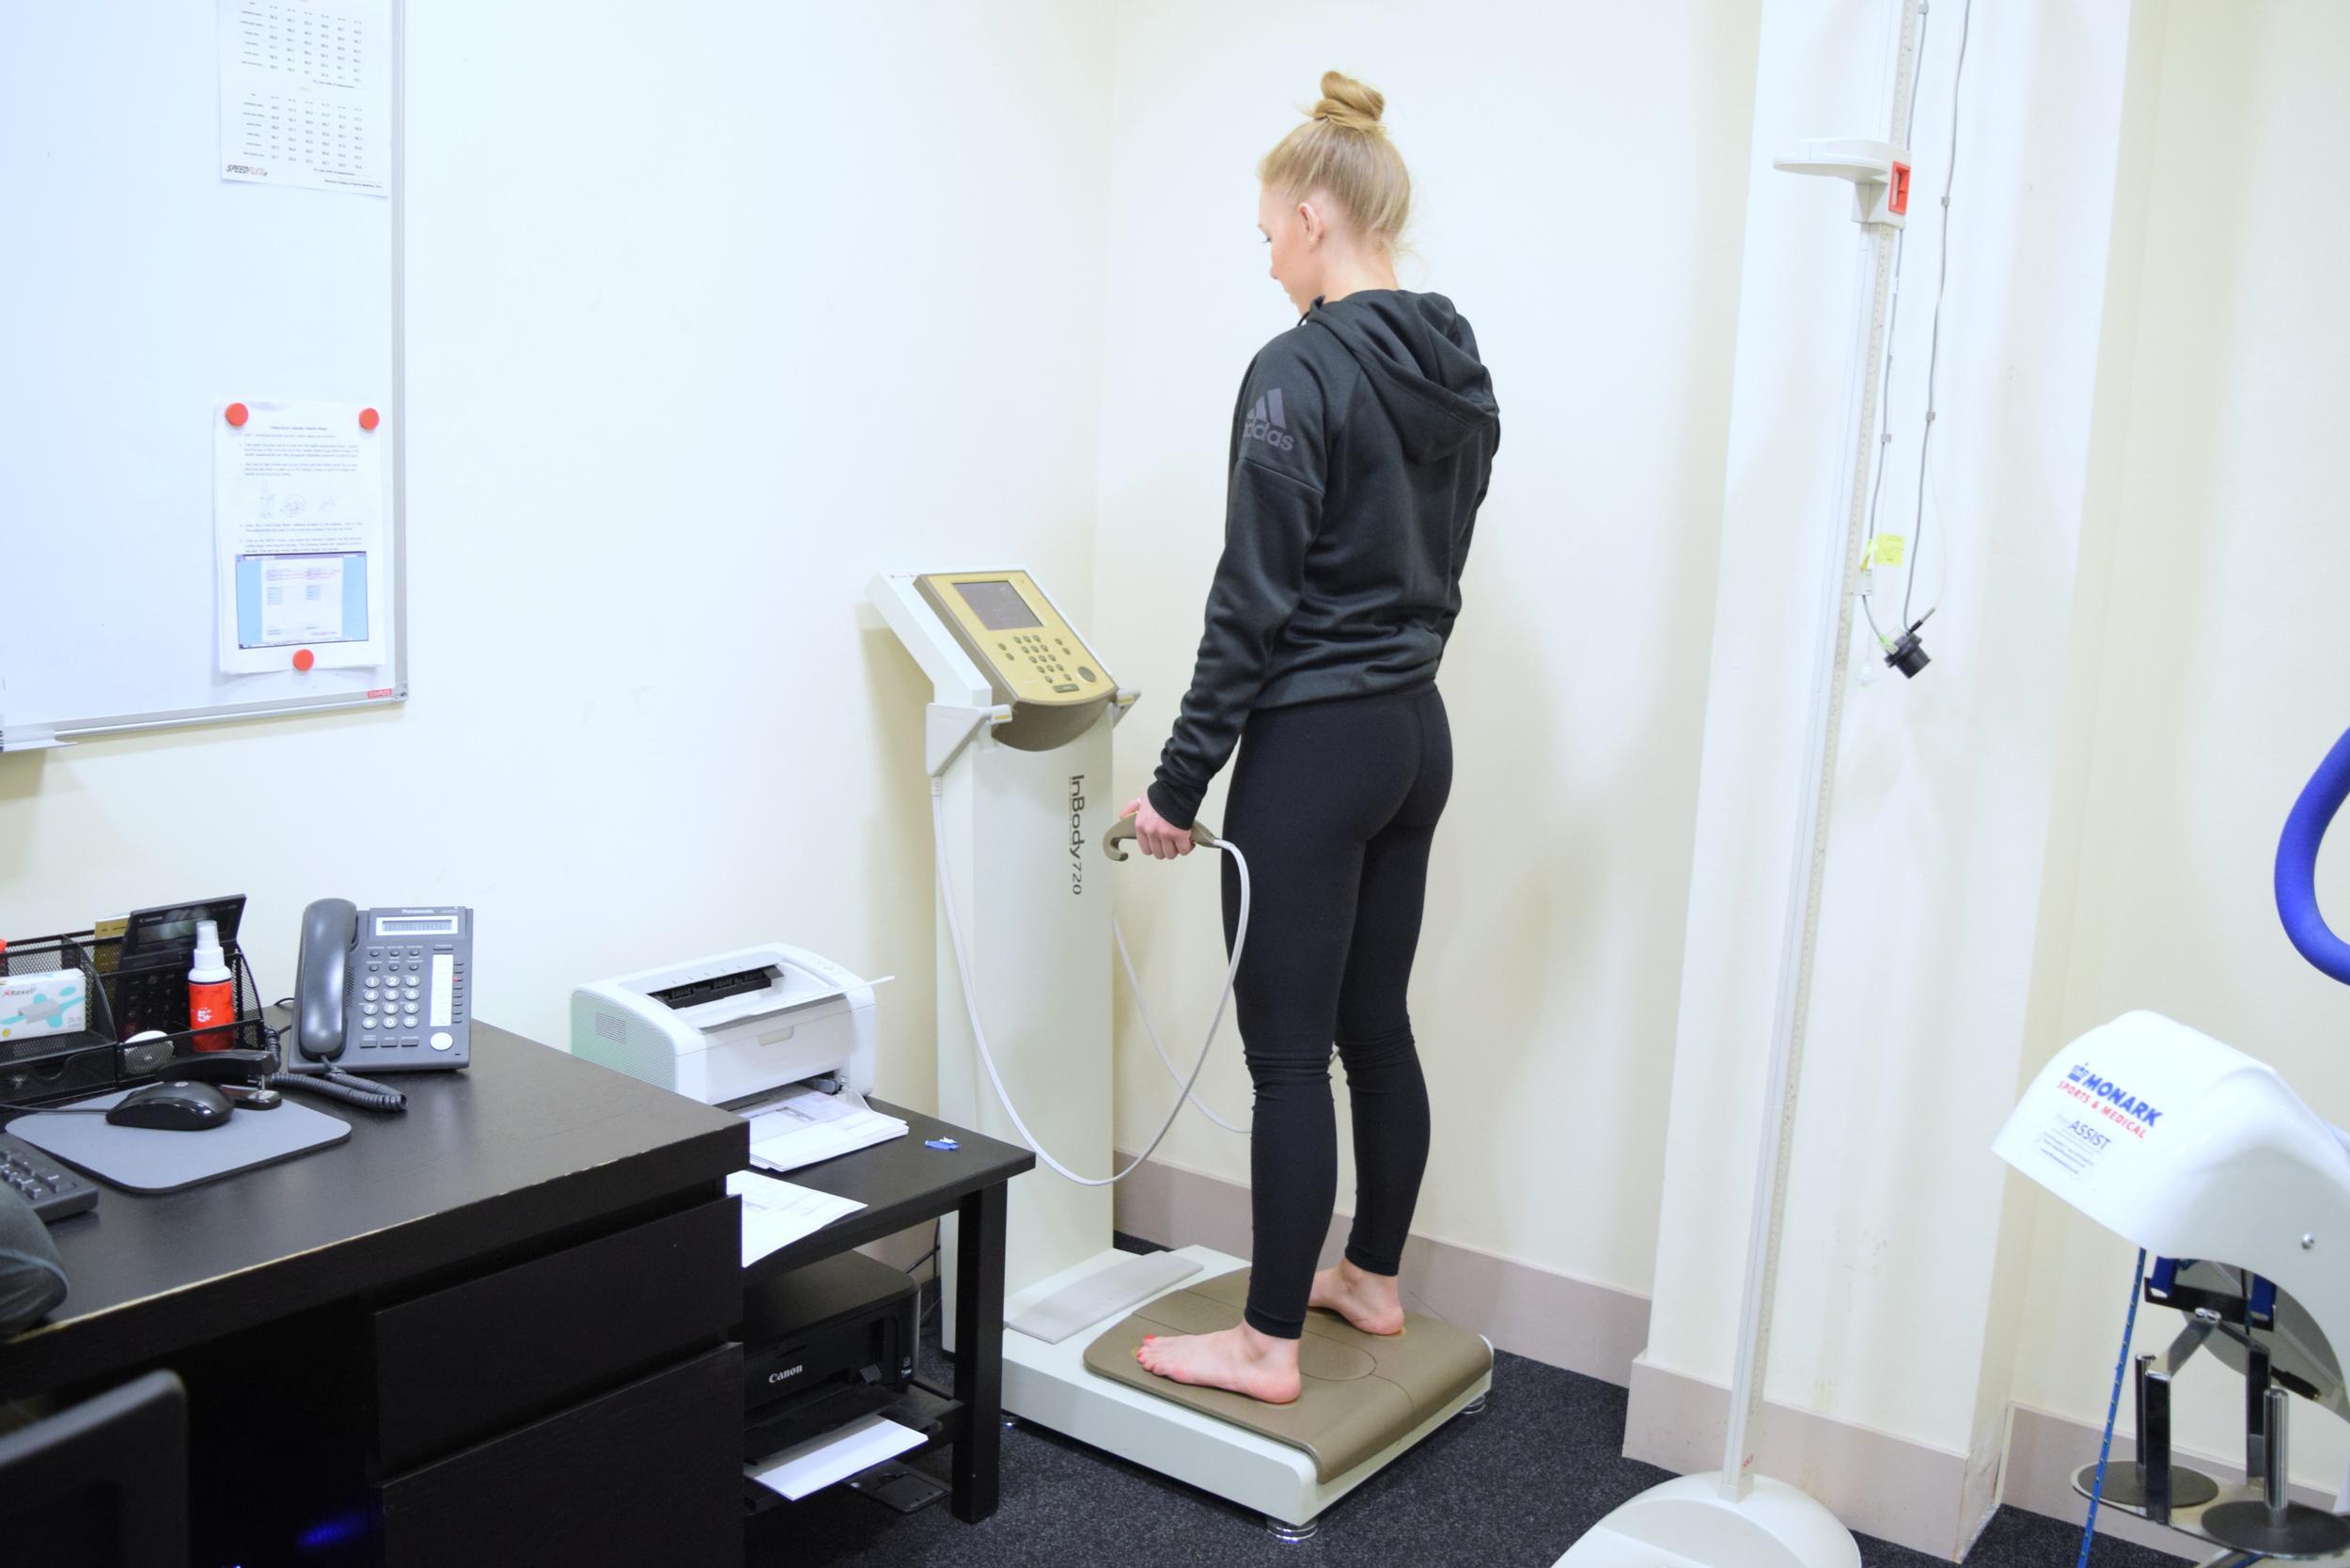 Speedflex Induction Body Composition Analysis